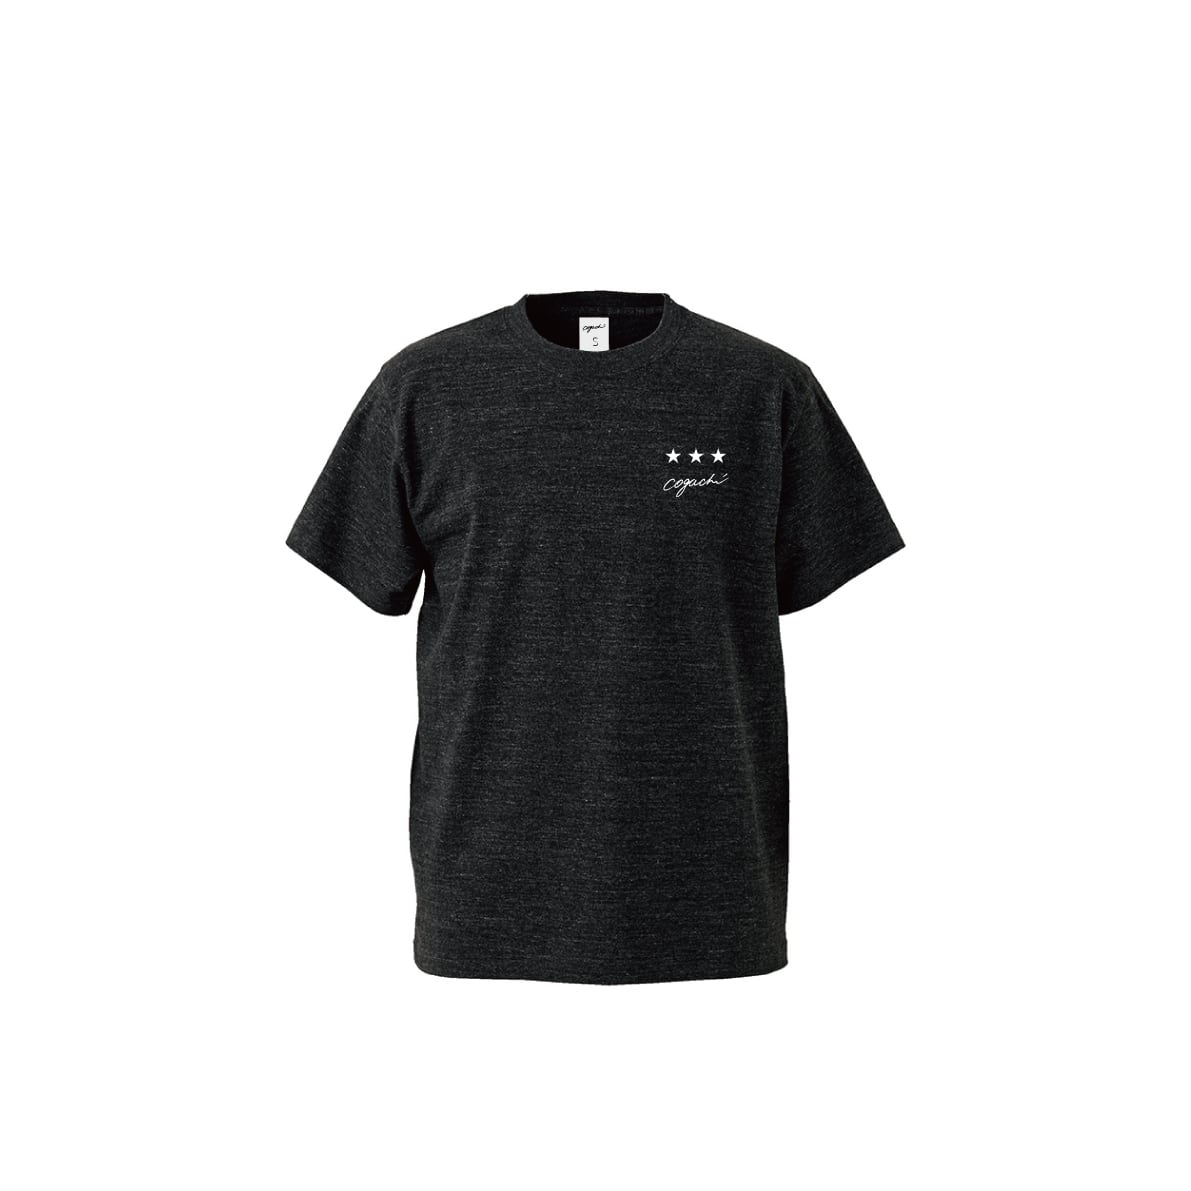 ST T-shirt(HEATHER BLACK)